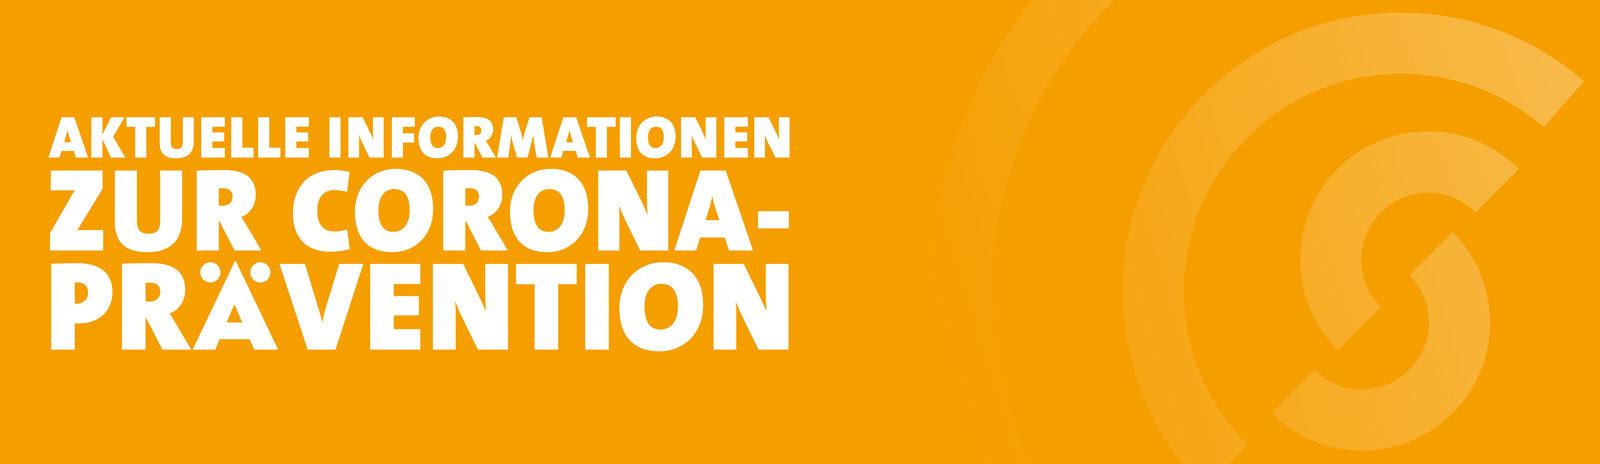 RZ_Slider_Corona_orange_aktuell_1